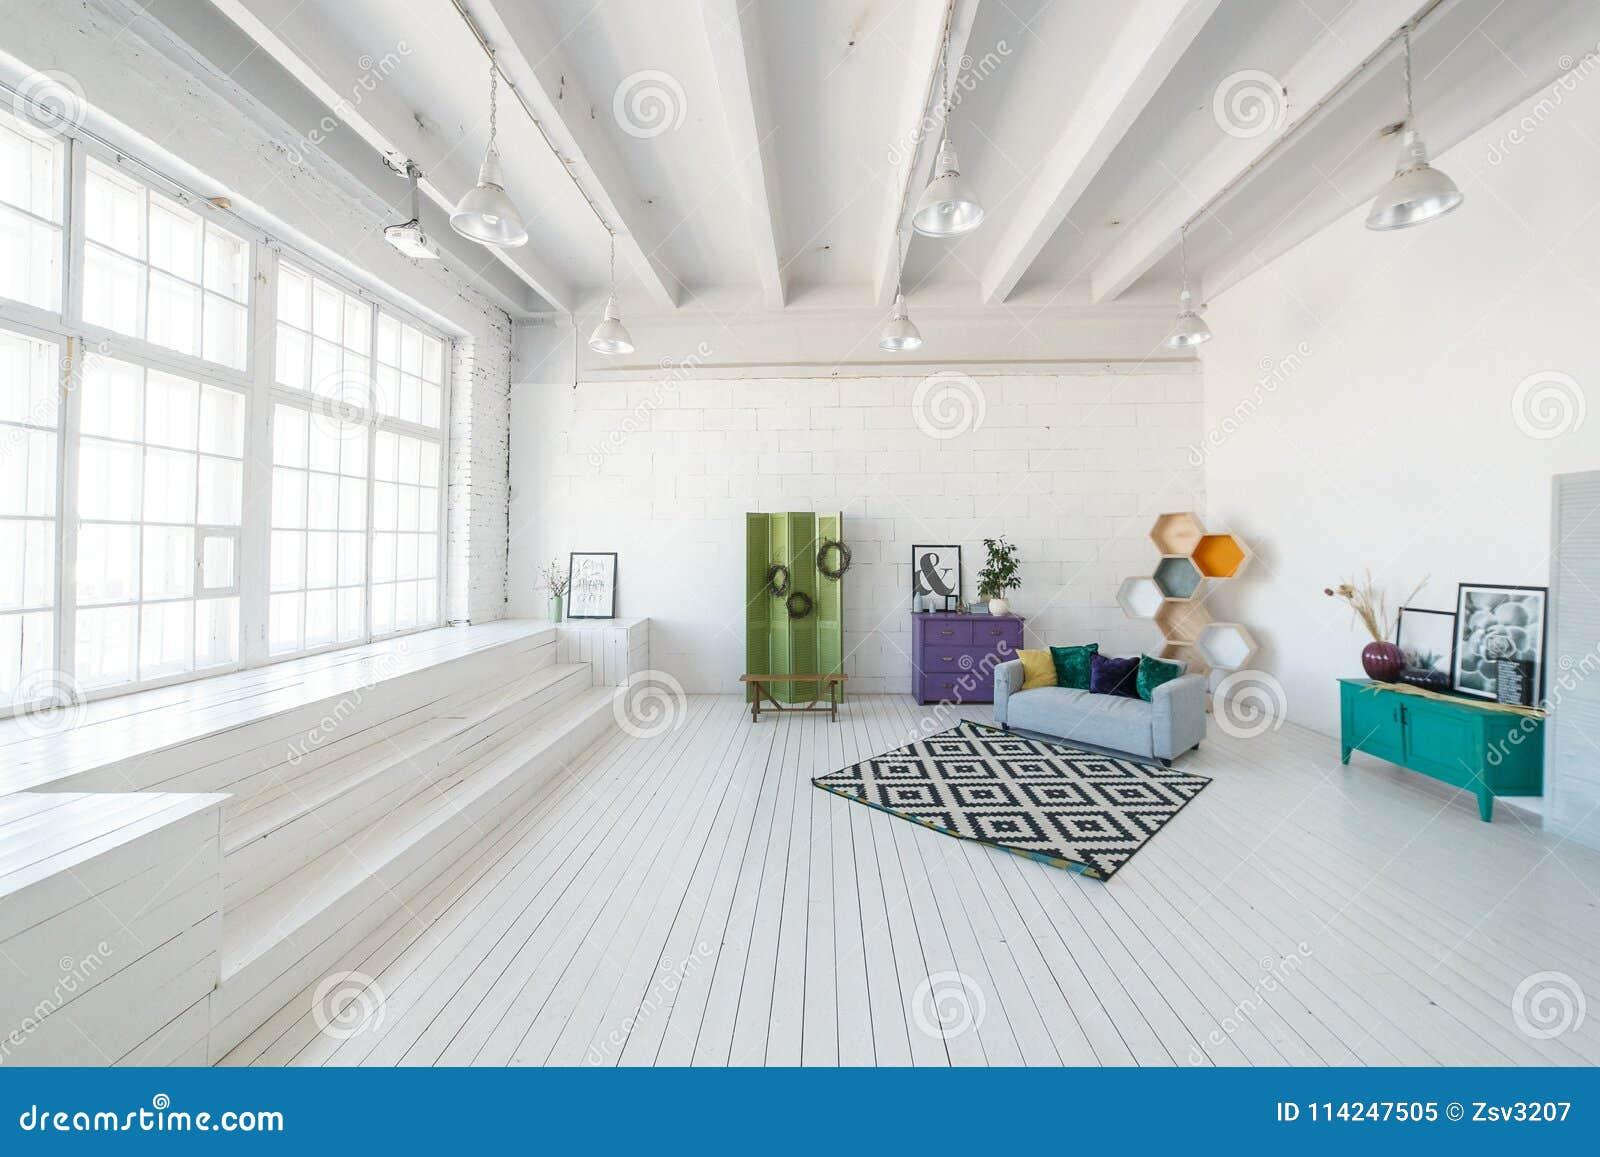 Soffitti In Legno Bianchi : Caffè bianco soffitto in legno poster u foto stock